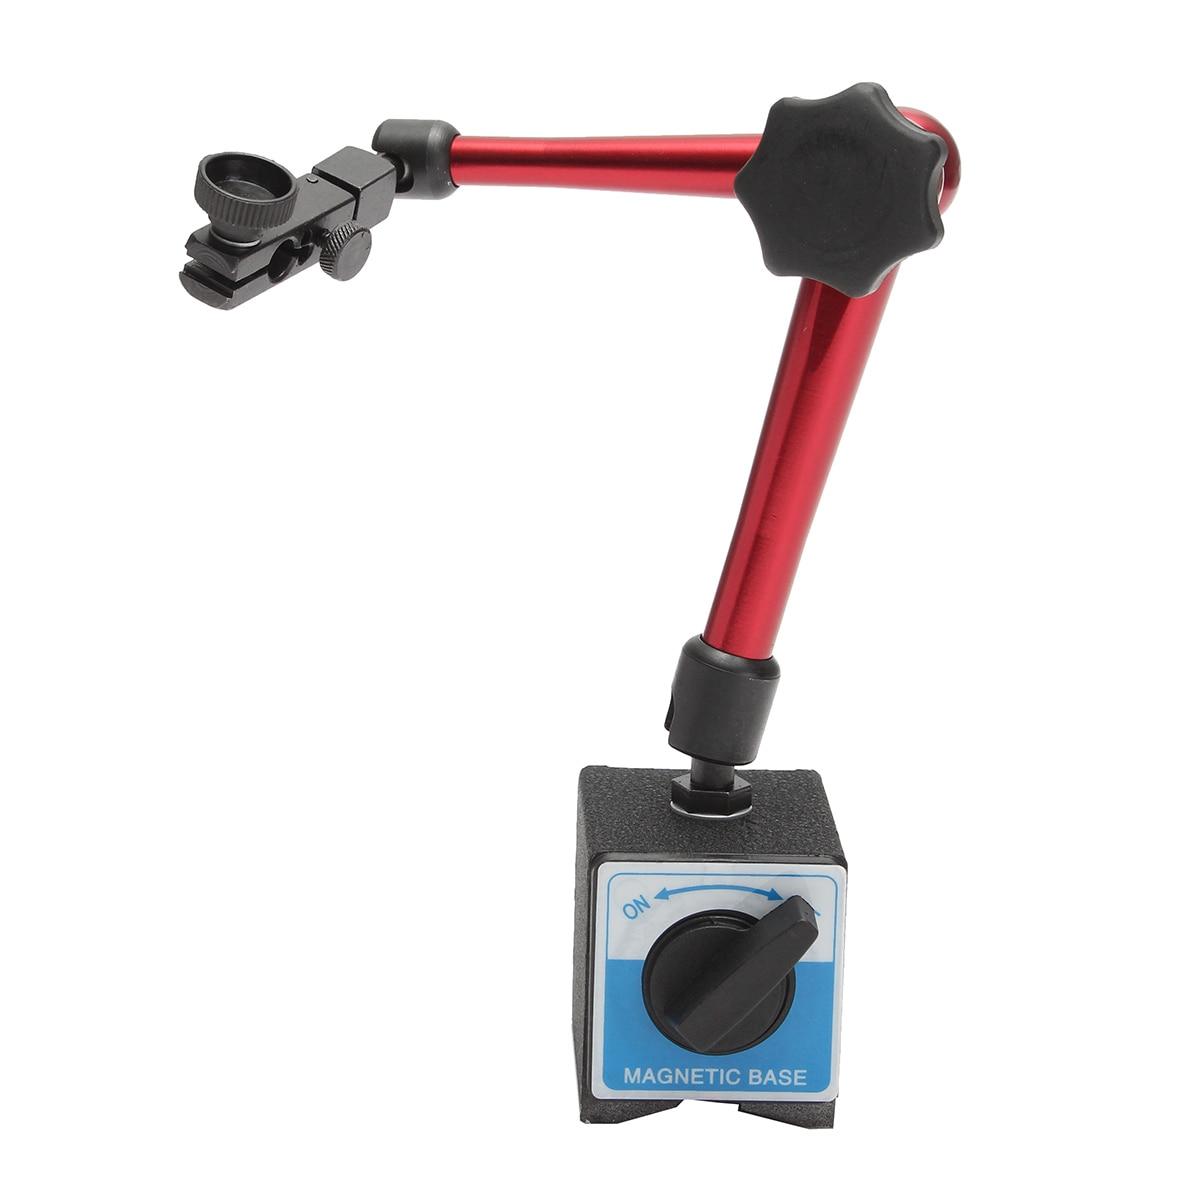 35cm Magnetic Base Stand Digital Dial Test Indicator Flexible Holder Table Scale Precision Indicator Center Finder Measurement